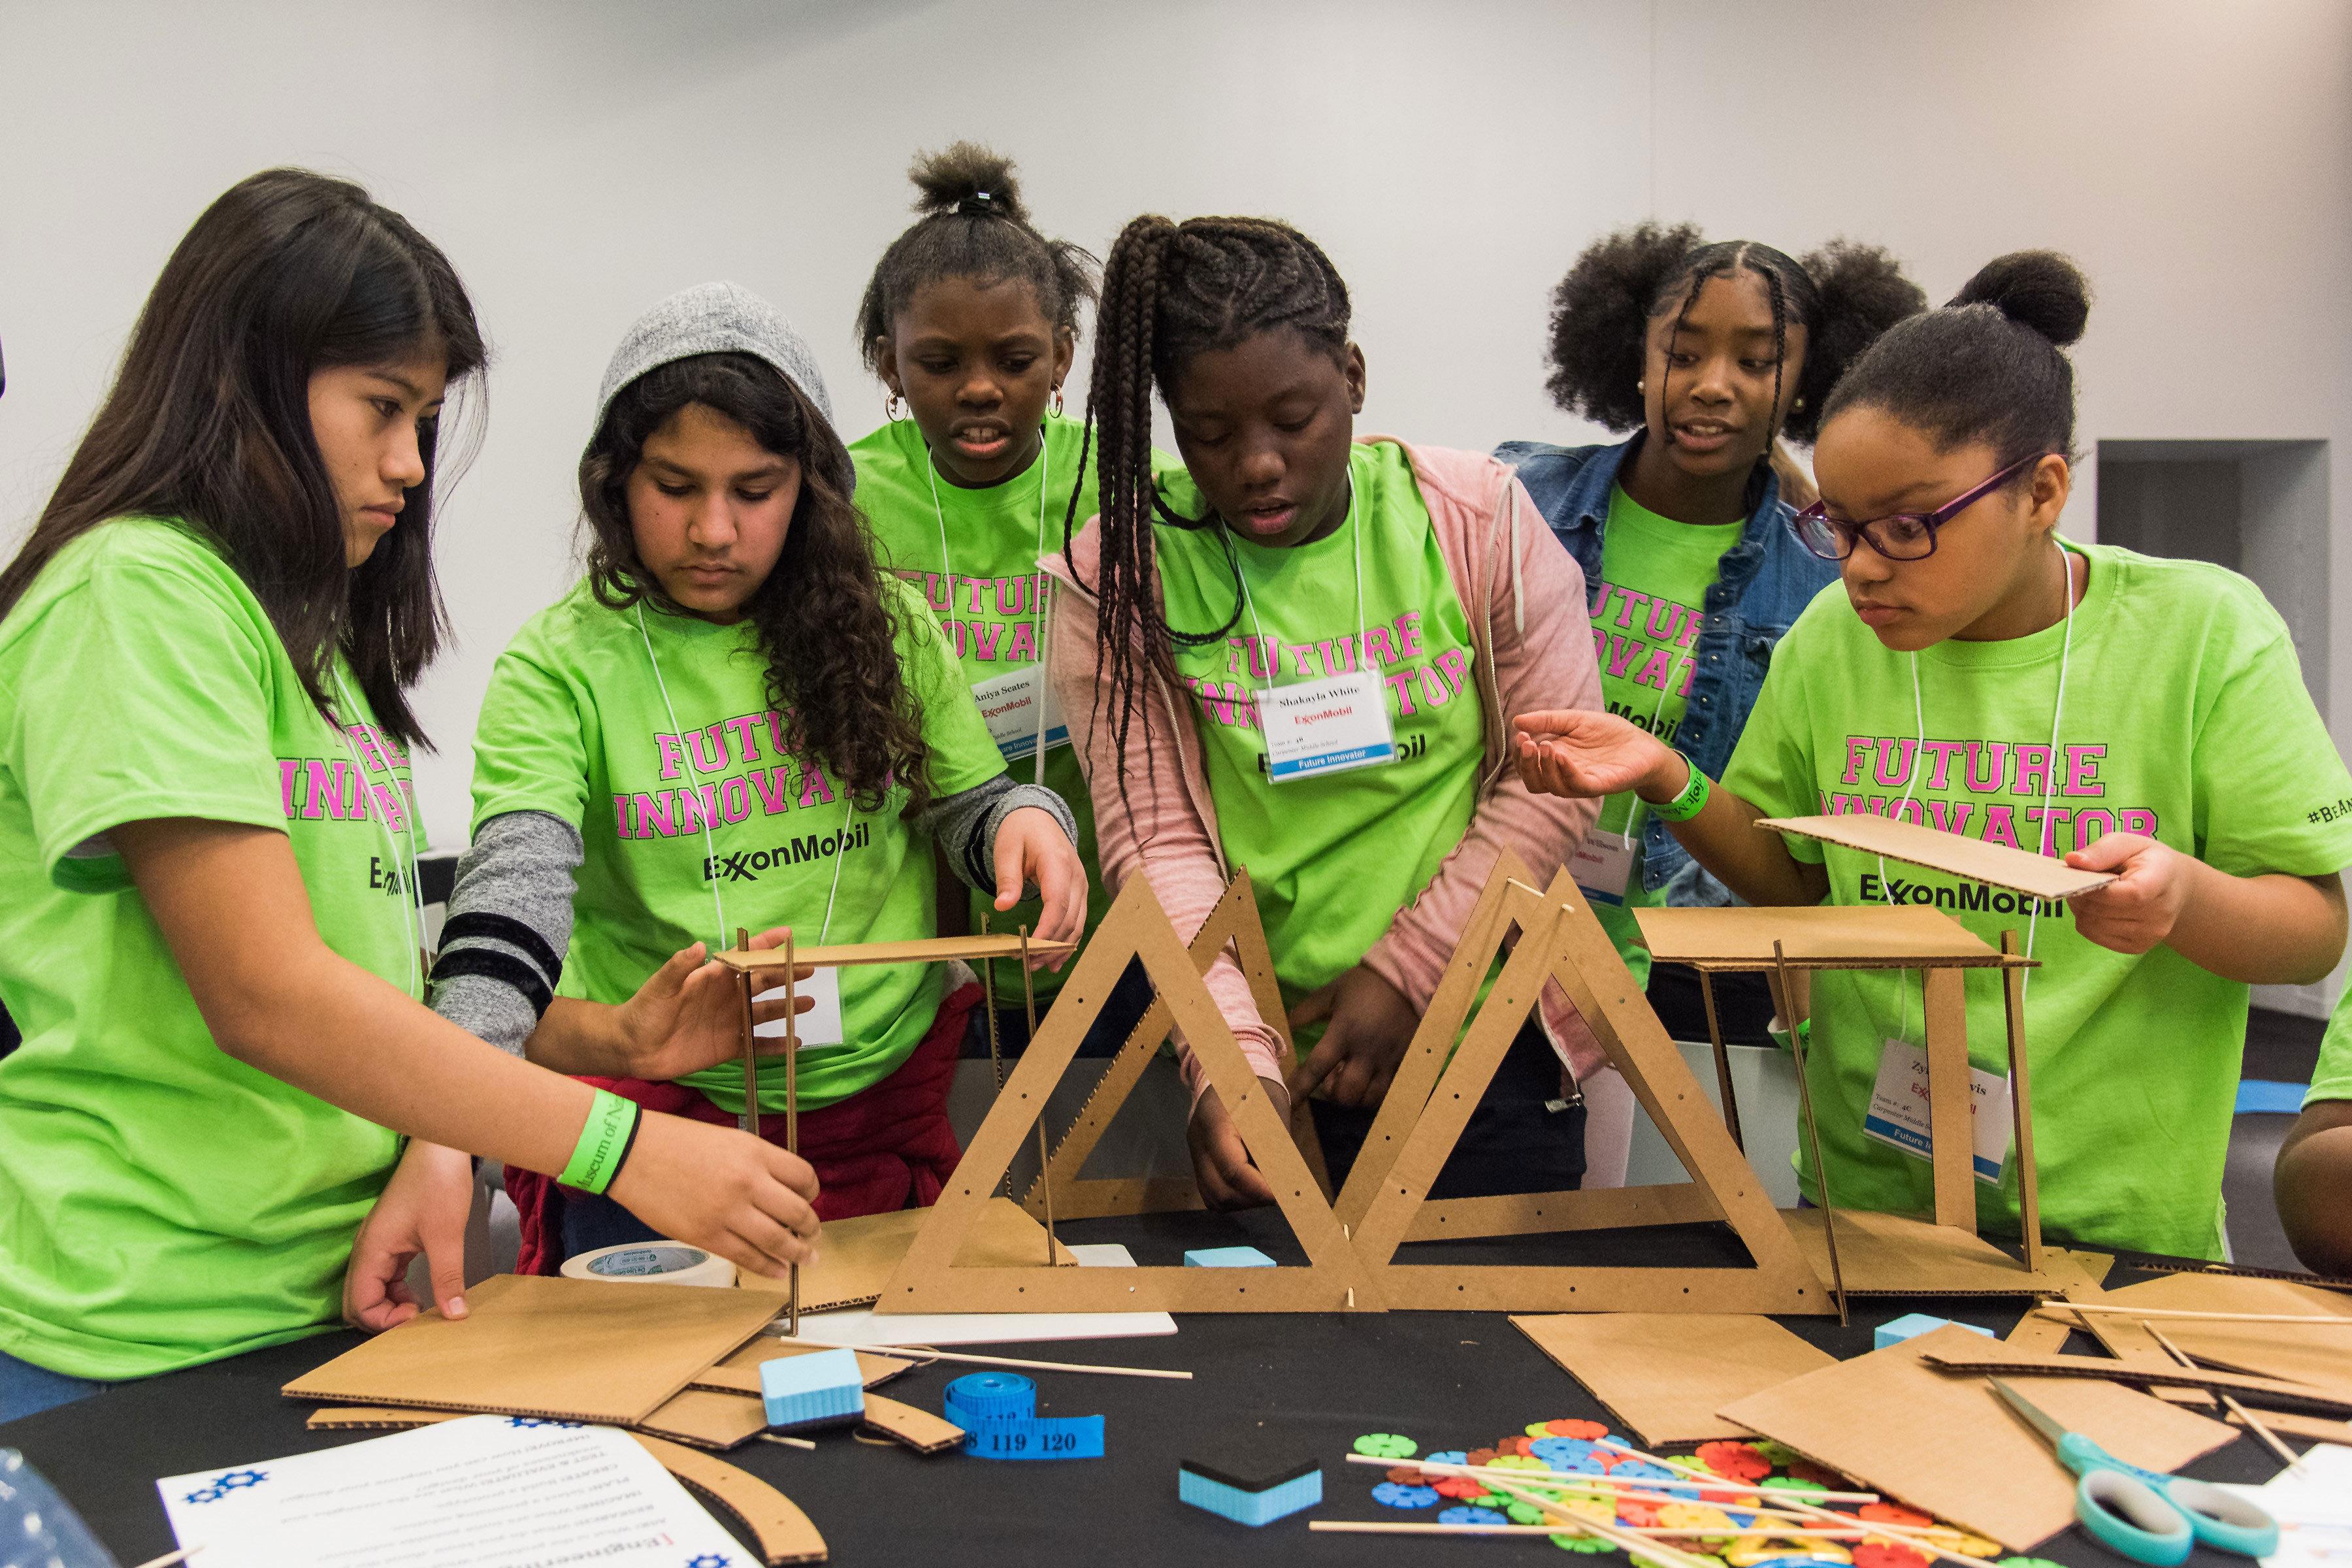 exxonmobil employees inspire girls to pursue engineering